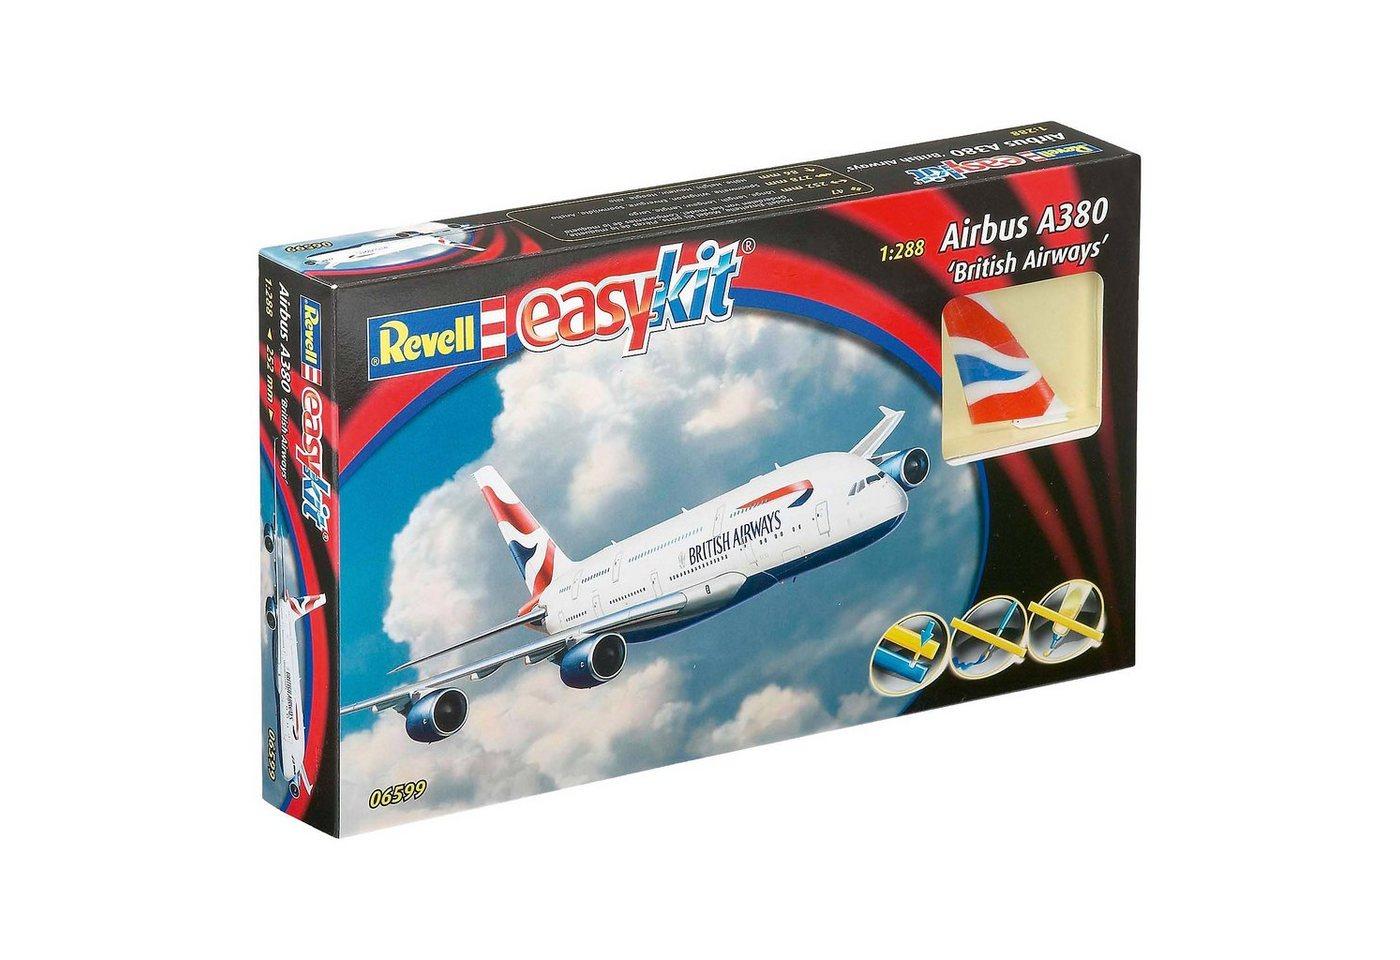 Revell® Modellbausatz ´´easykit´´ Airbus A380 British Airways